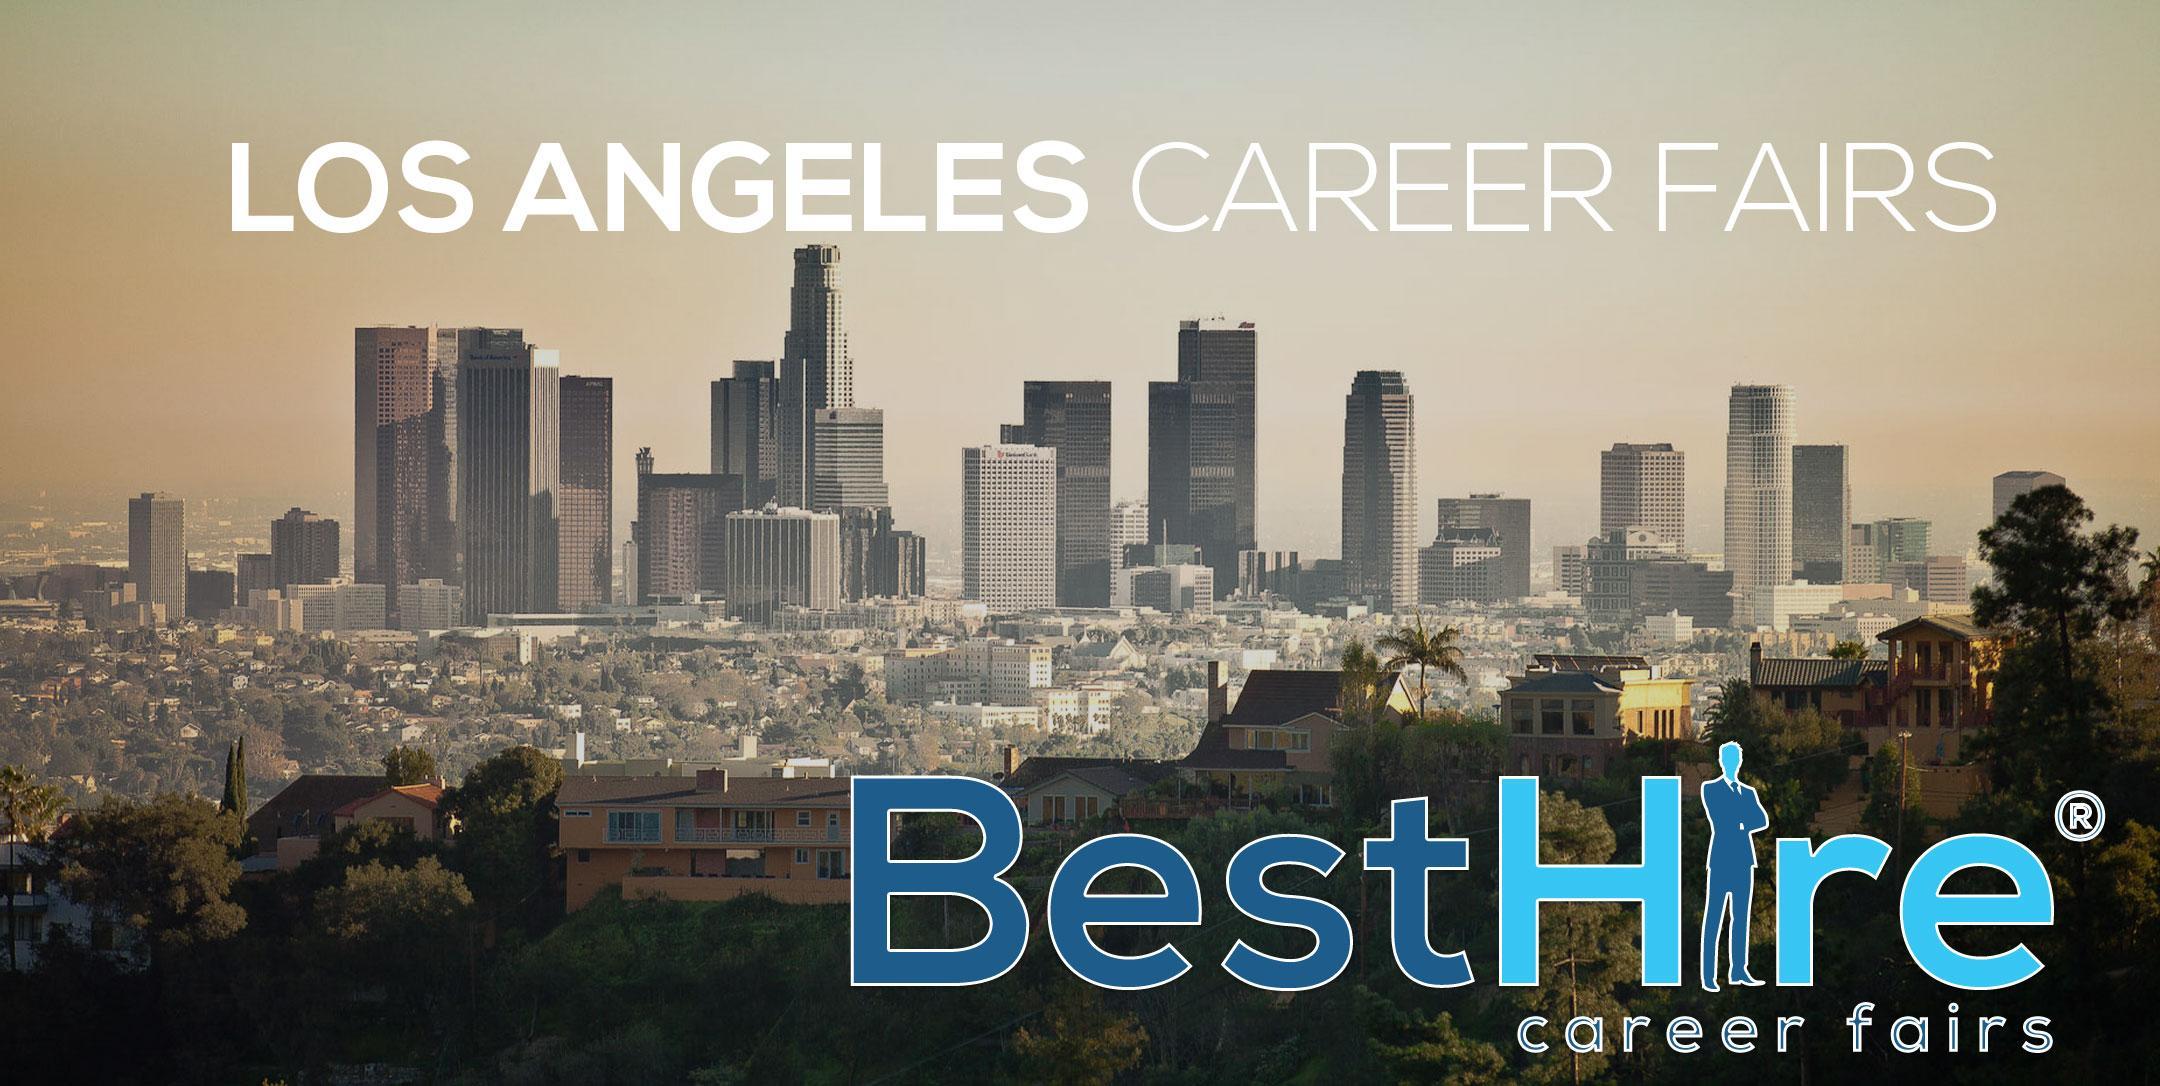 Los Angeles Career Fair - April 12, 2018 Job Fairs & Hiring Events in Los Angeles CA